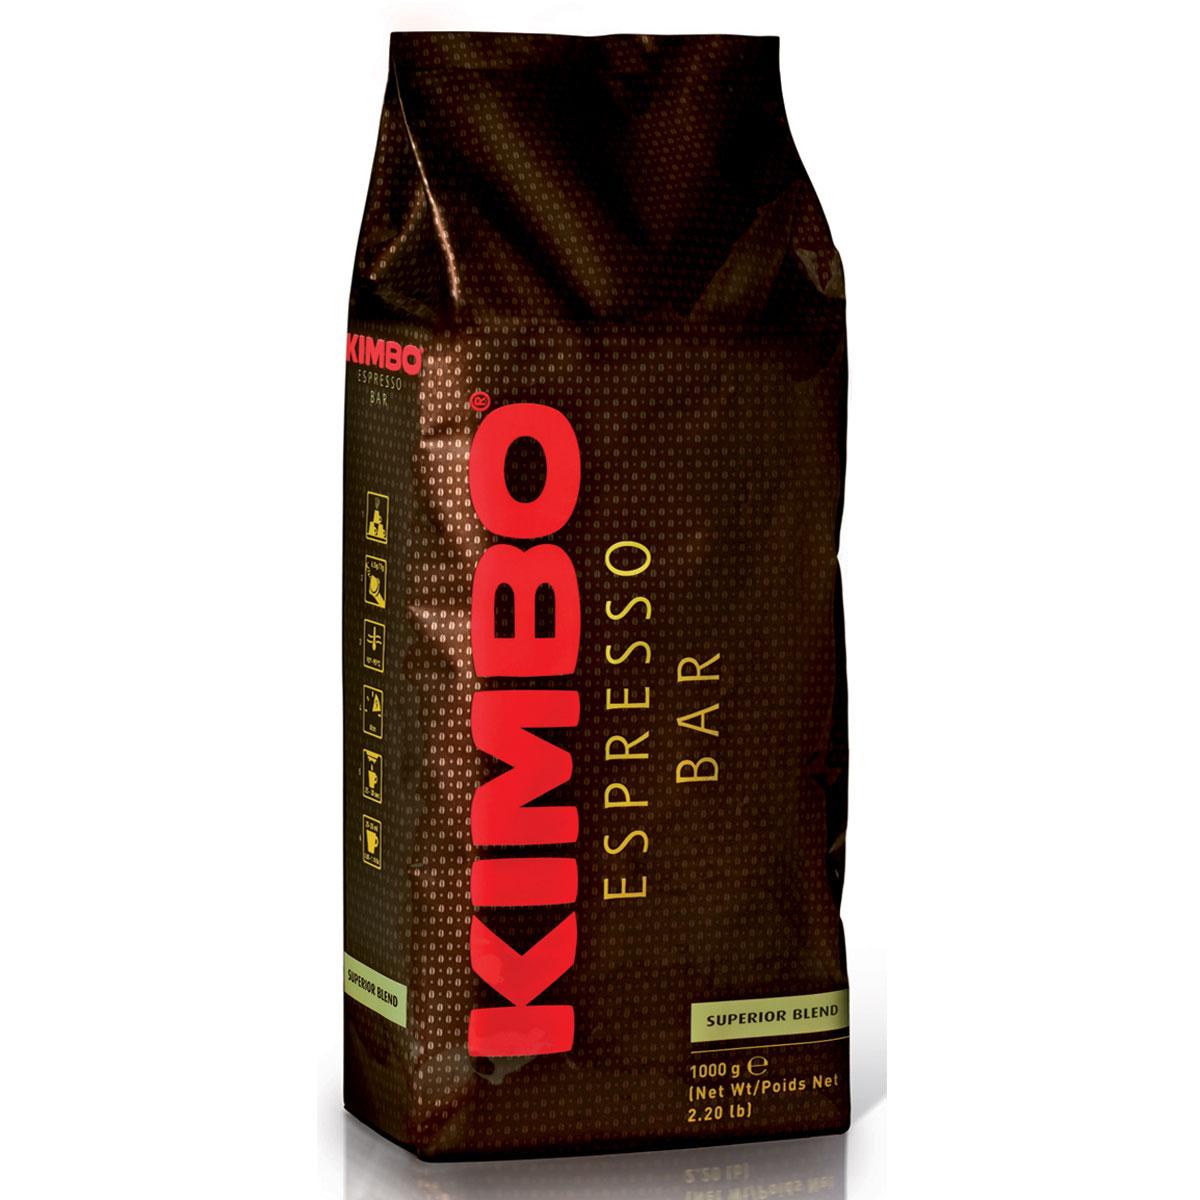 Kimbo Superior Blend кофе в зернах, 1 кг8002200140021